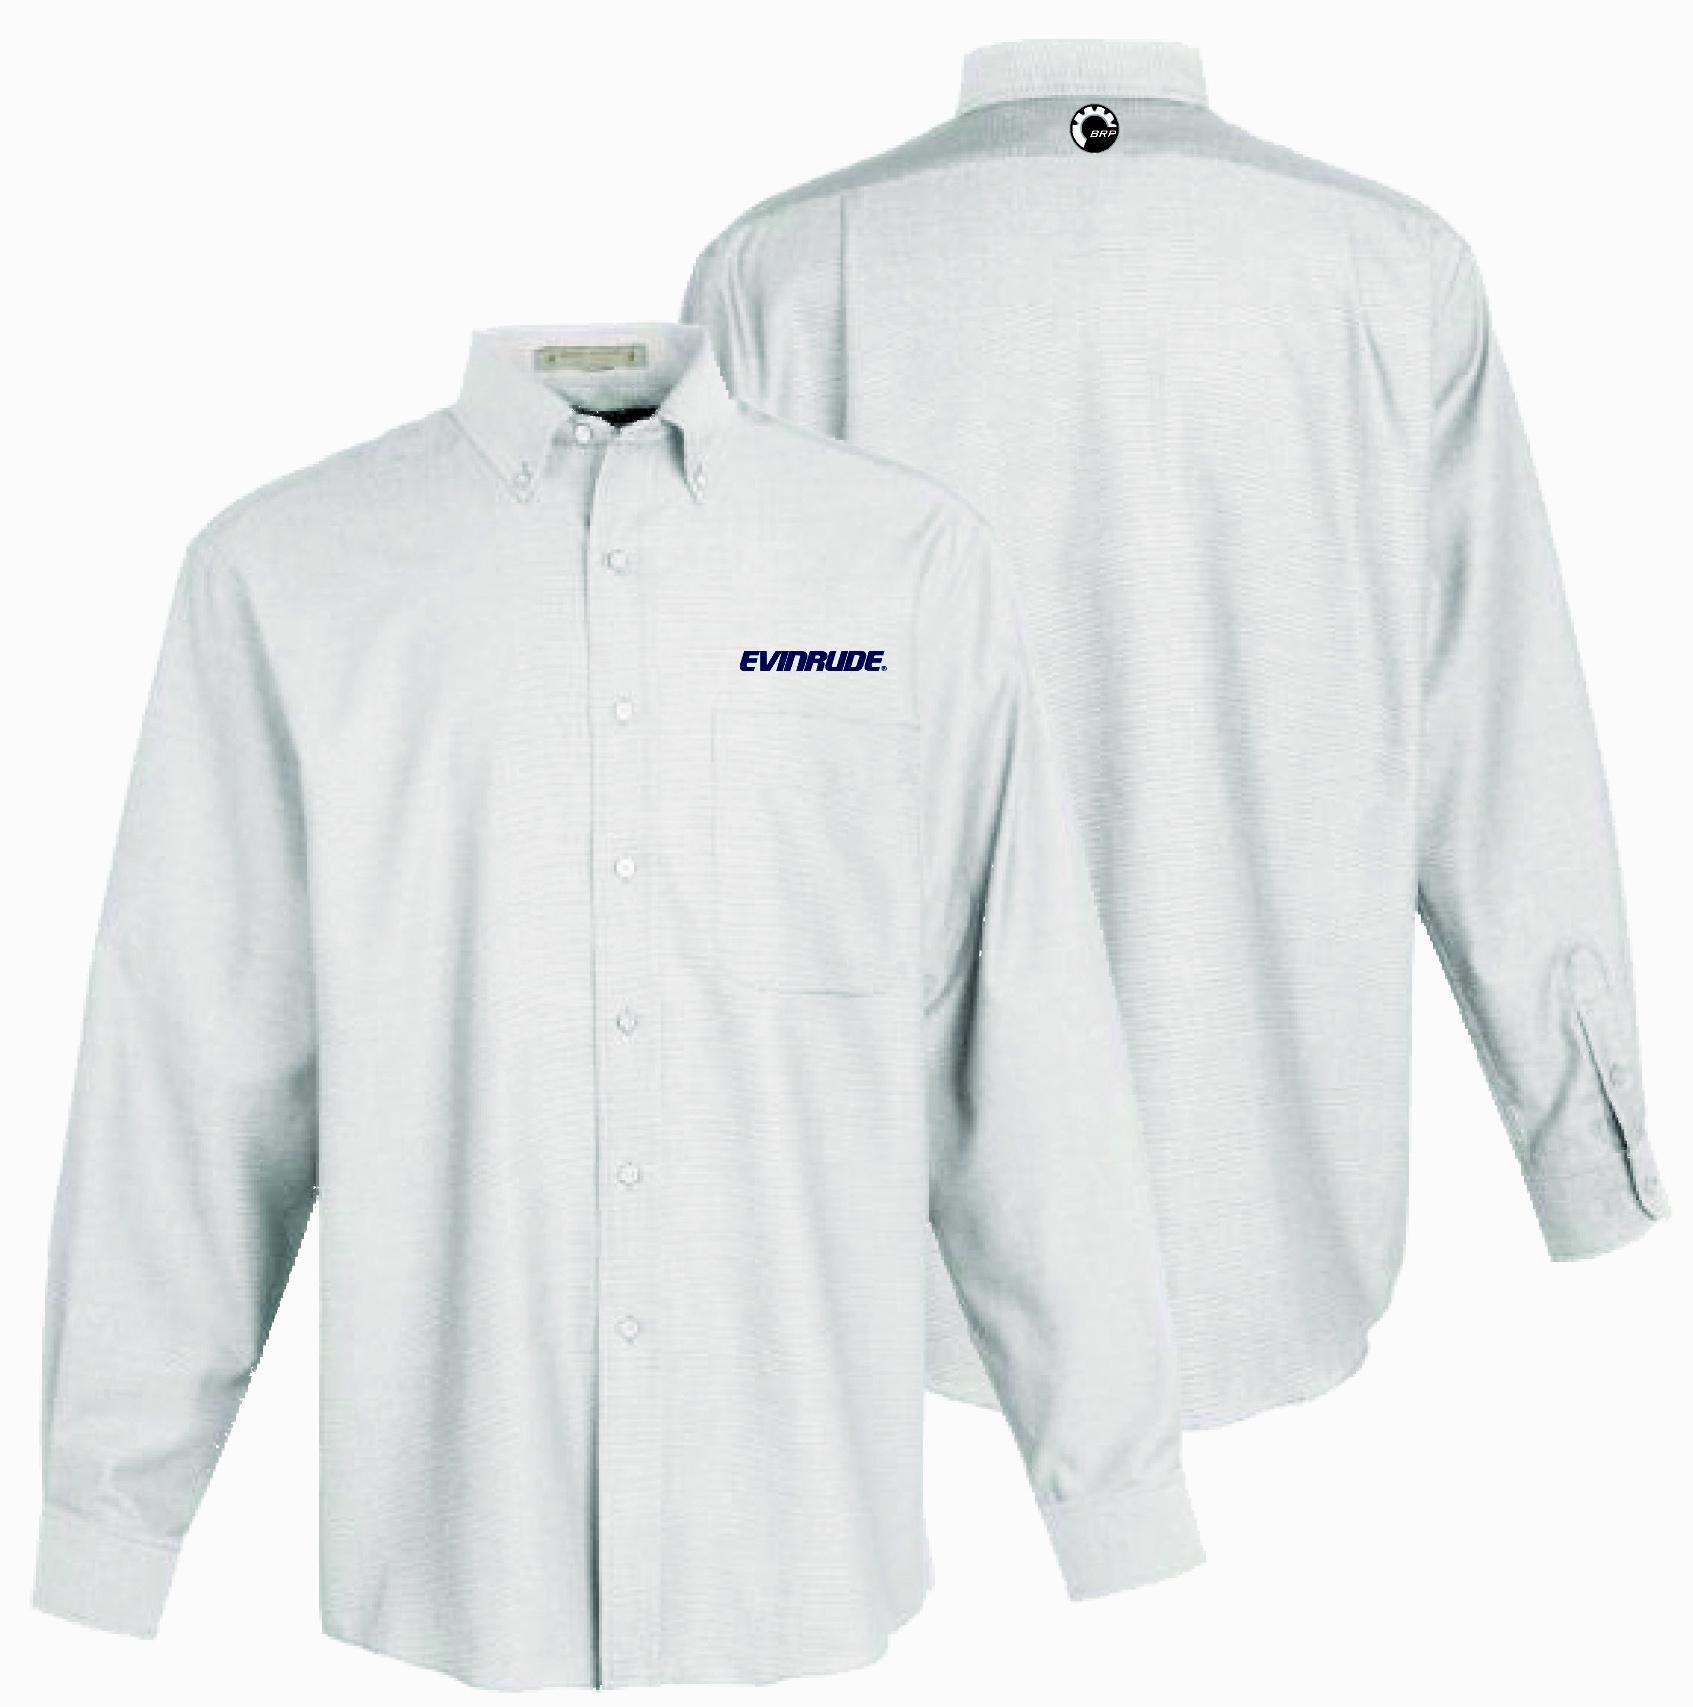 Vintage White Shirt 58